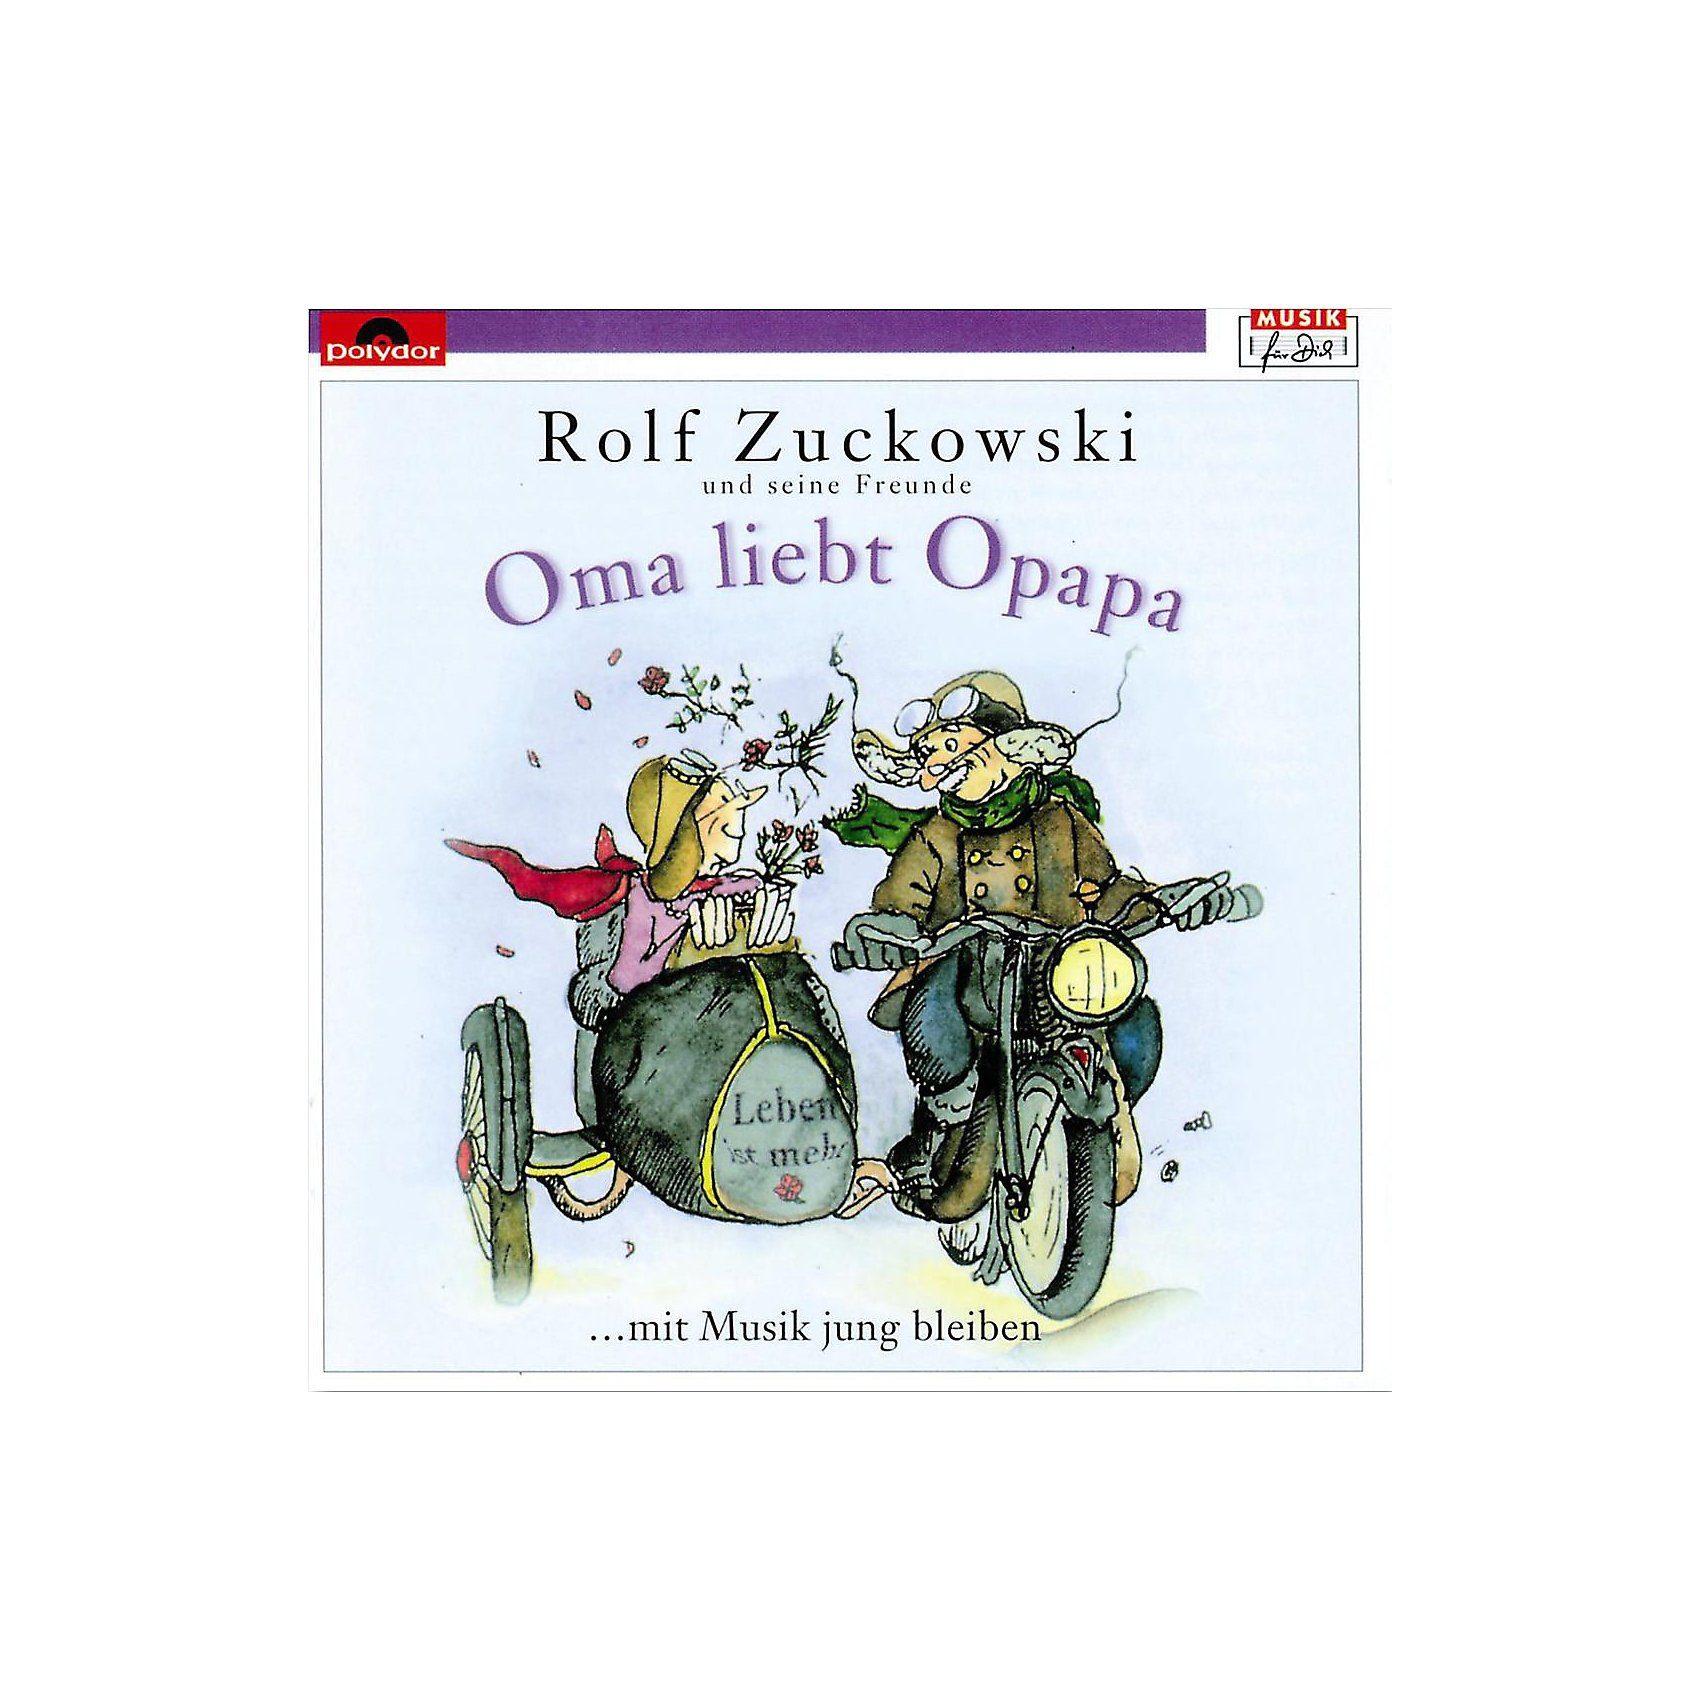 Universal Music GmbH CD Rolf Zuckowski - Oma liebt Opapa